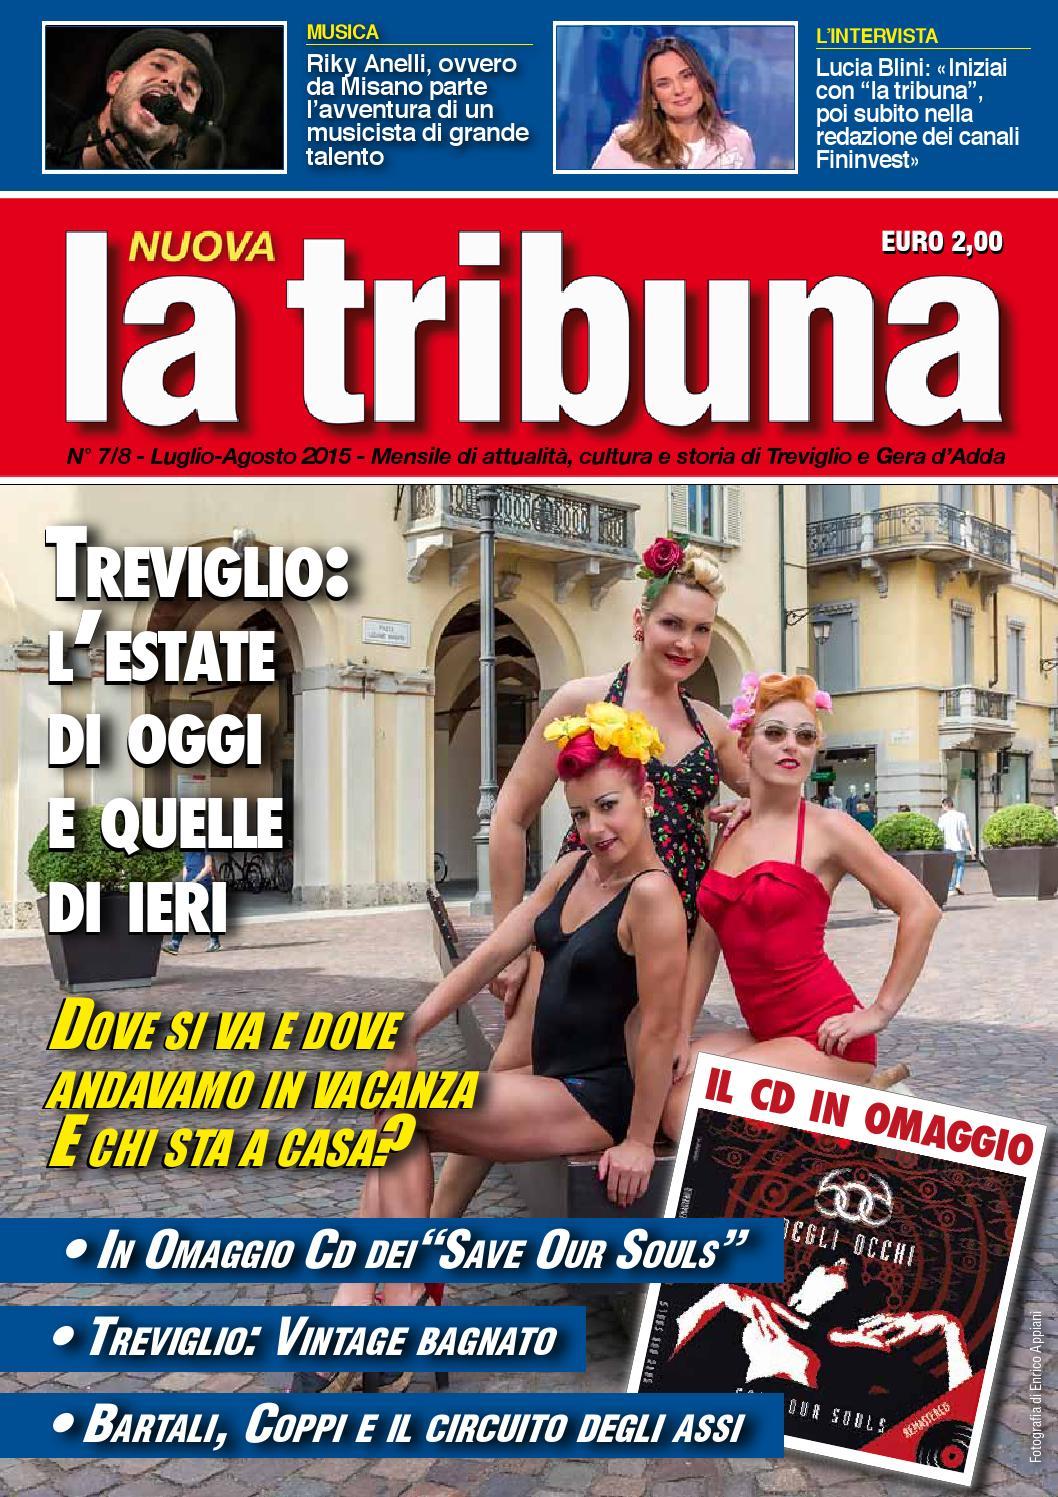 Tribuna 07 08 2015 by lanuovatribuna - issuu e71433fb5b2e